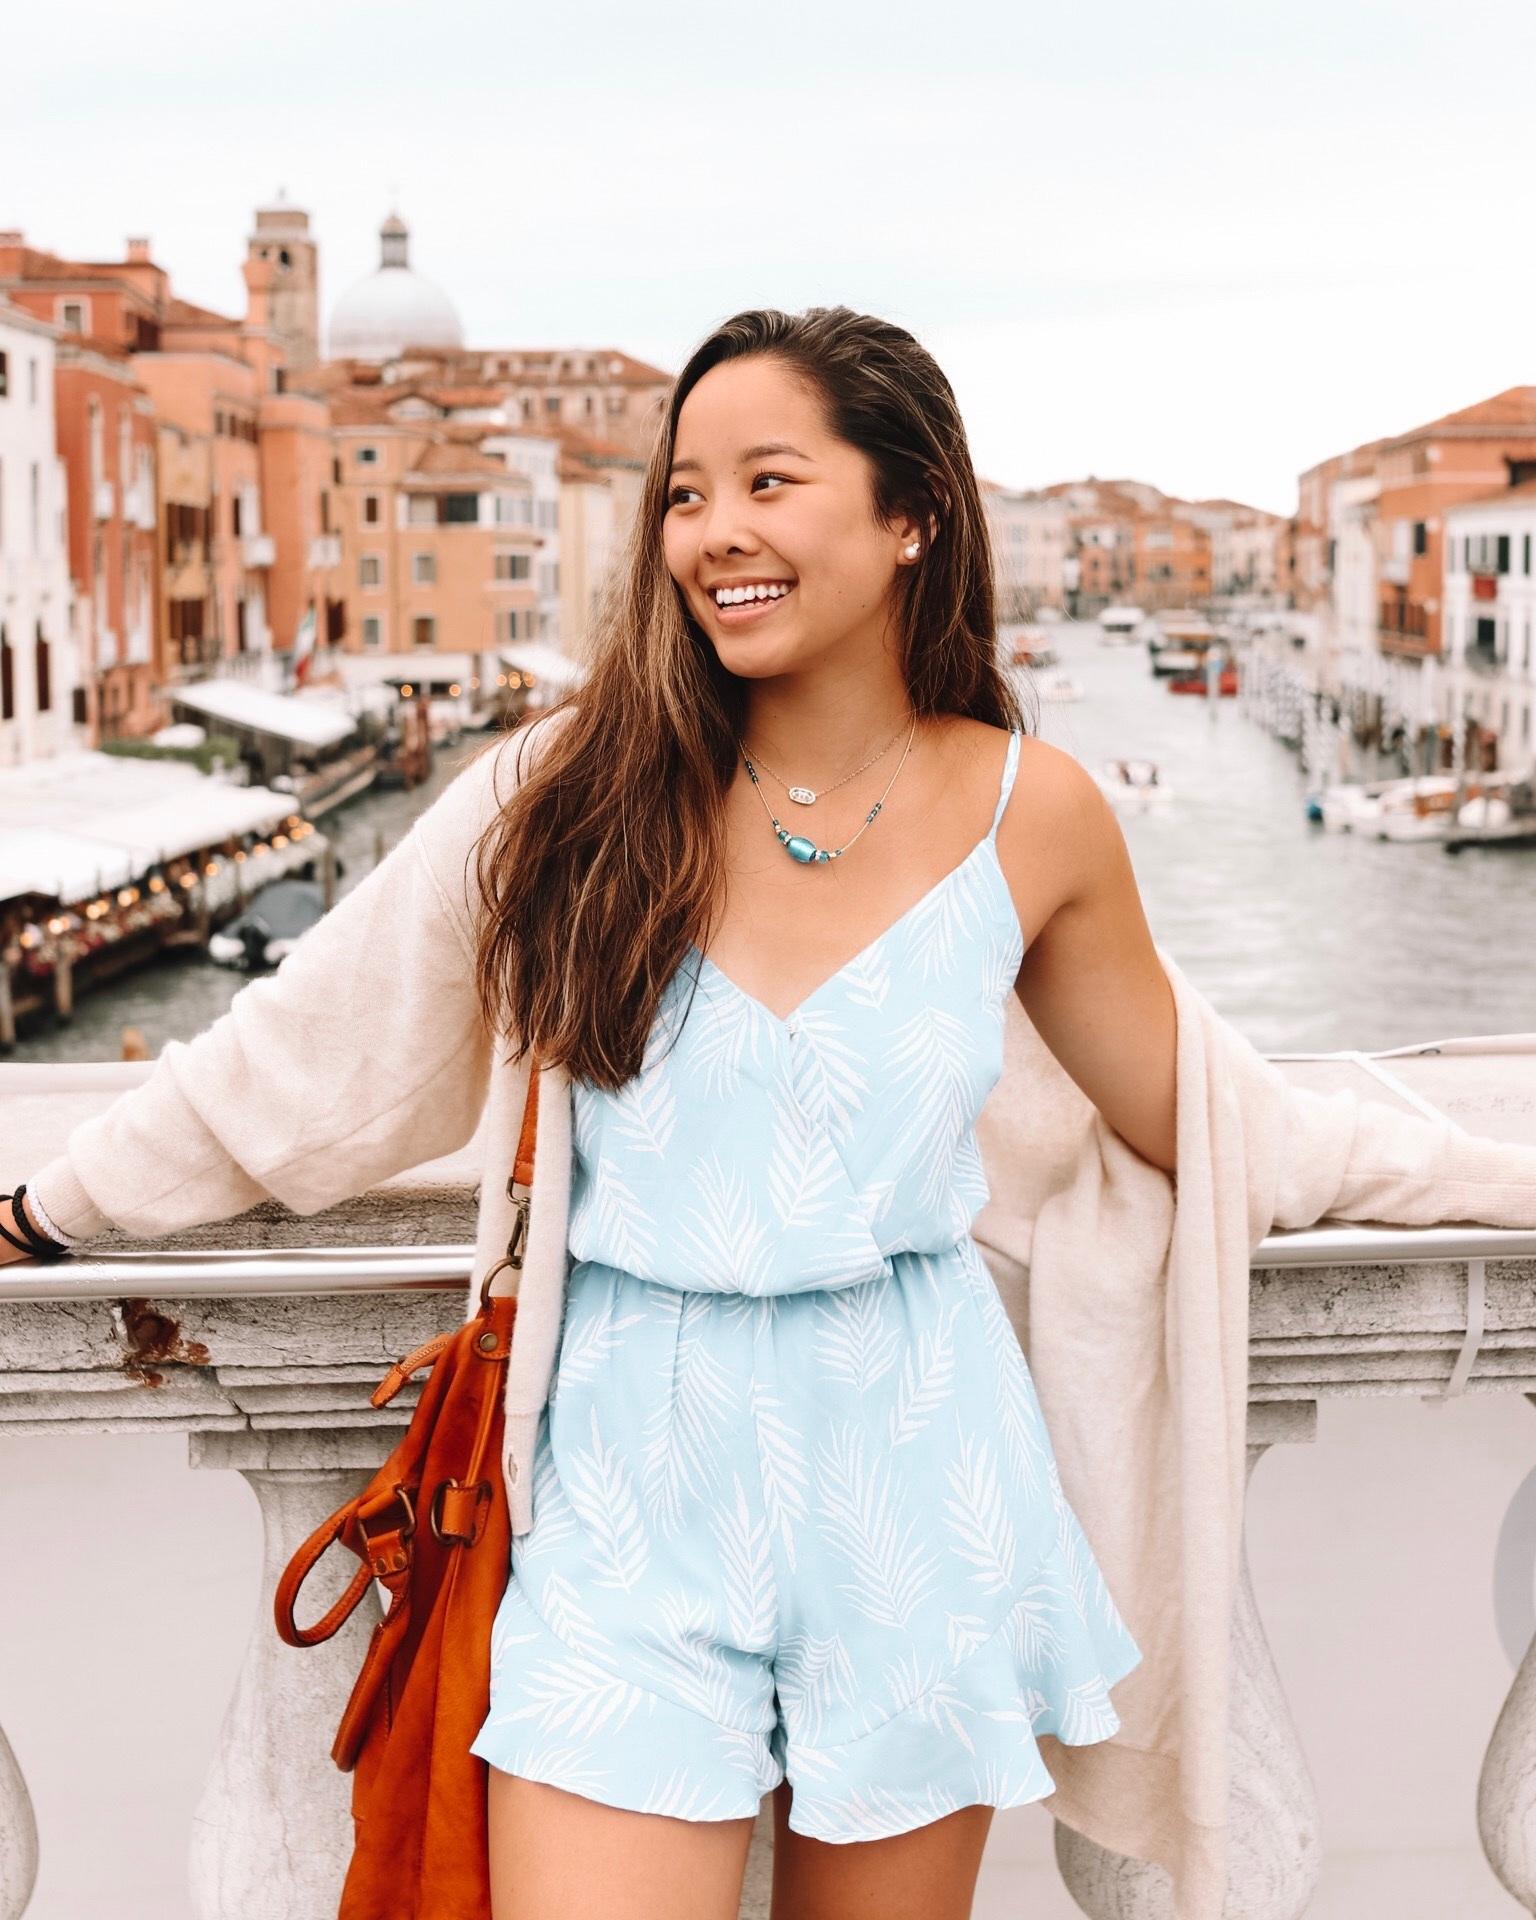 Venice+-+Caitlin+Nguyen.jpg